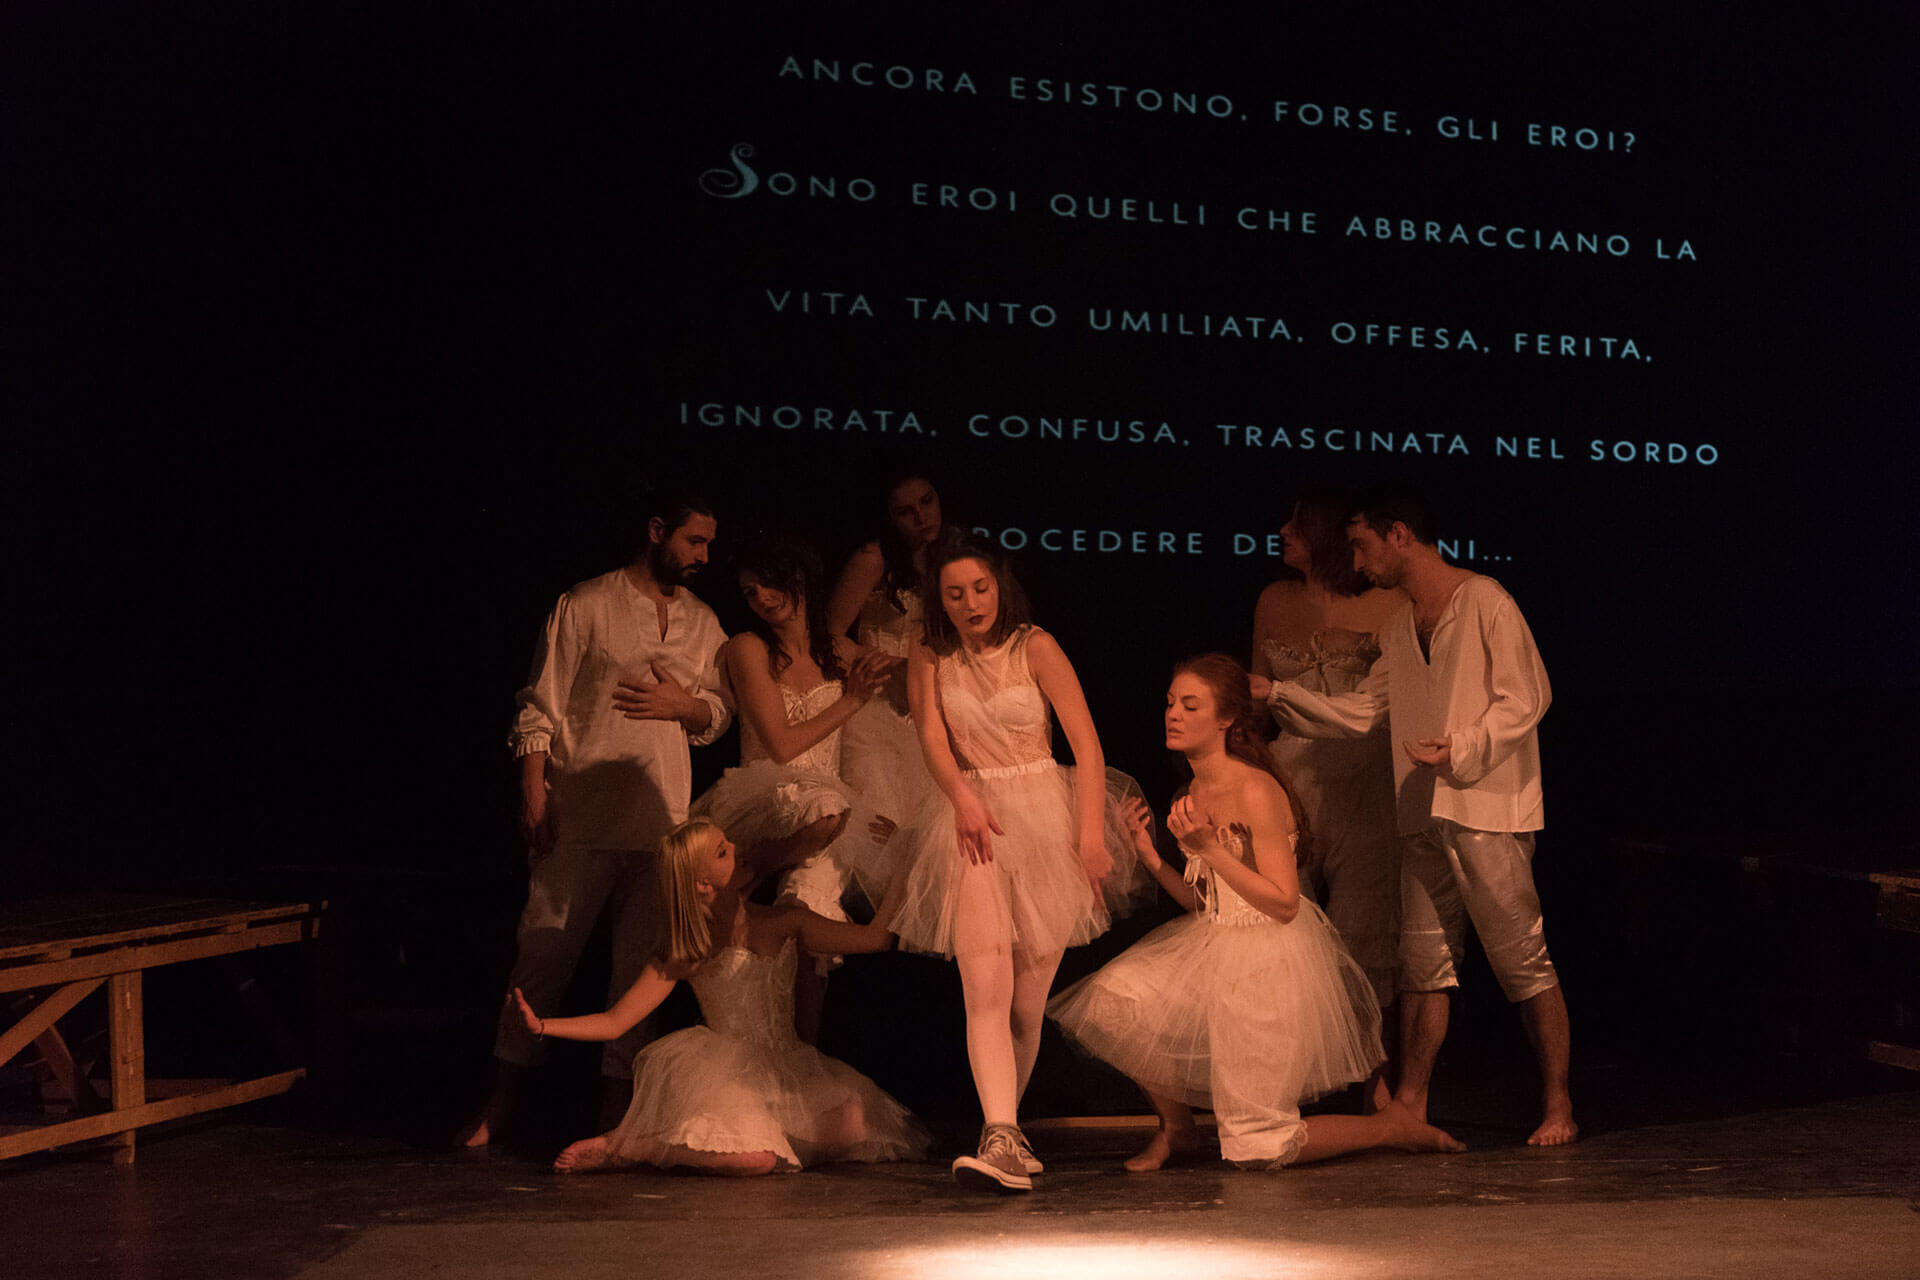 gruppo-teatro-colli-casanova-under-construction-2017-4